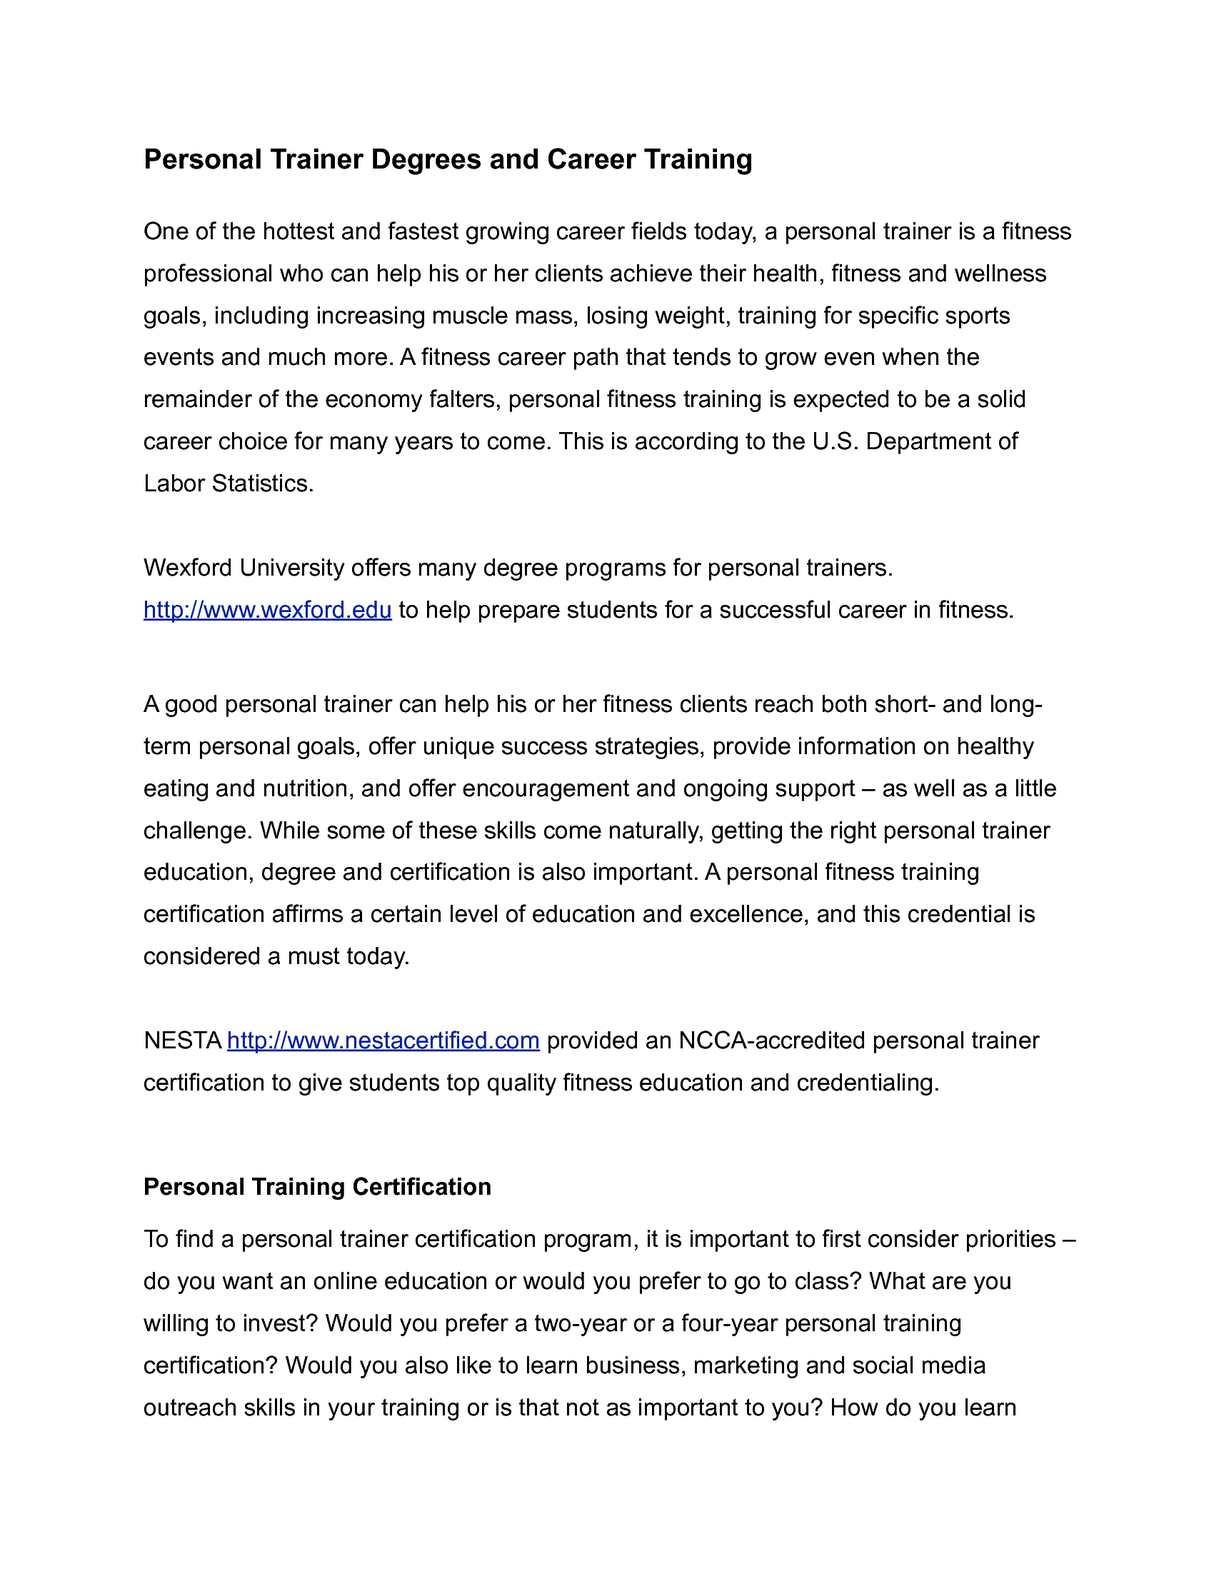 Calamo Personaltrainerdegreeandcareertraining